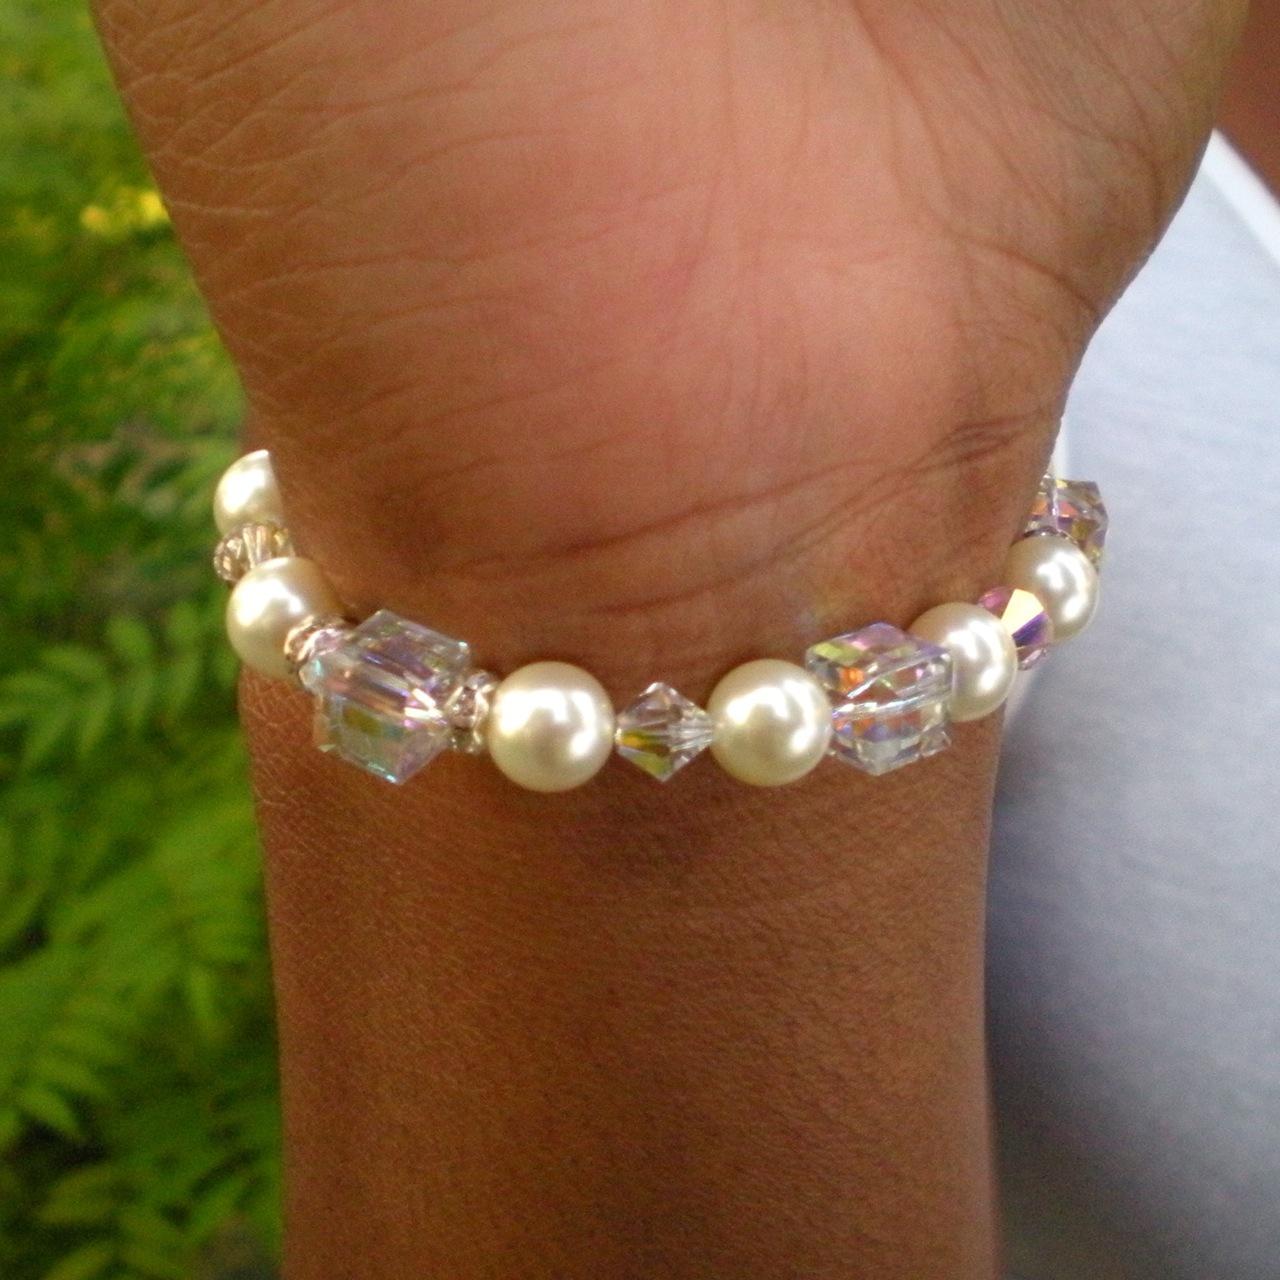 Jewelry, Bridesmaids, Bridesmaids Dresses, Fashion, white, silver, Bracelets, Crystal, Bracelet, Swarovski, Bead, Pearl, Dana saylor designs, Cube, Clasp, Silvertone